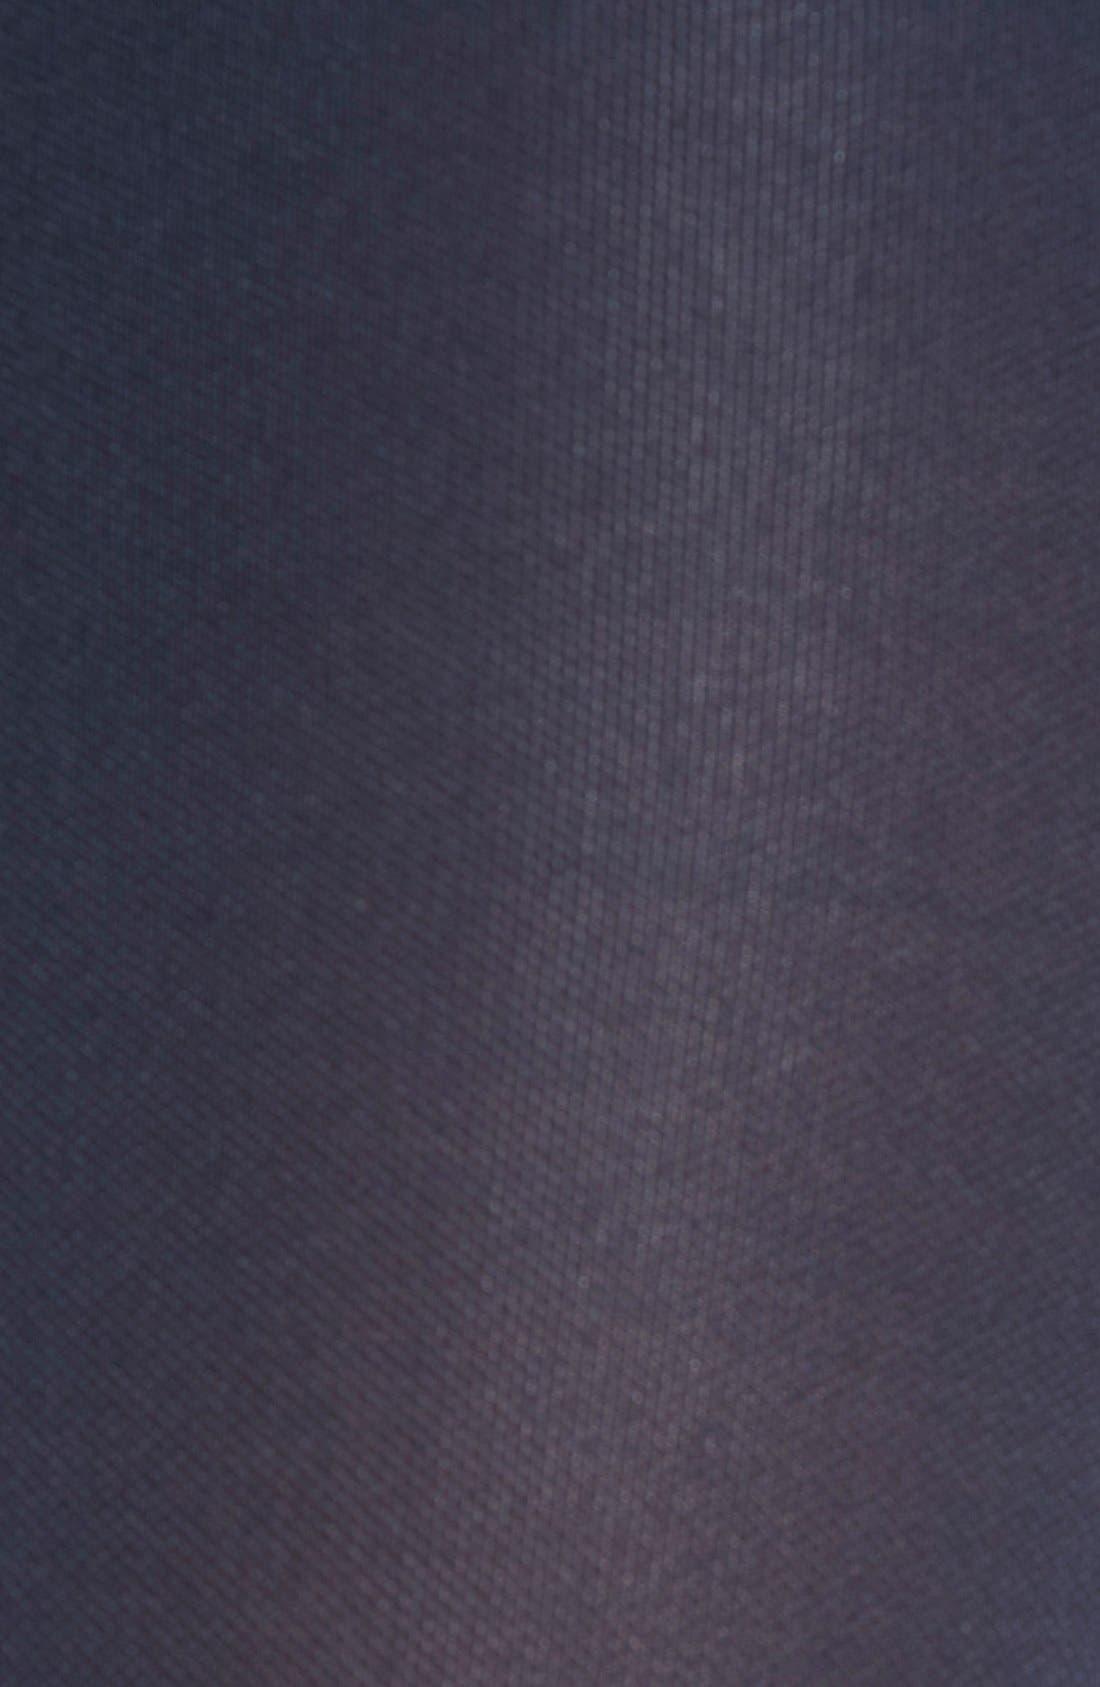 Alternate Image 2  - ITEM m6 Opaque Tights